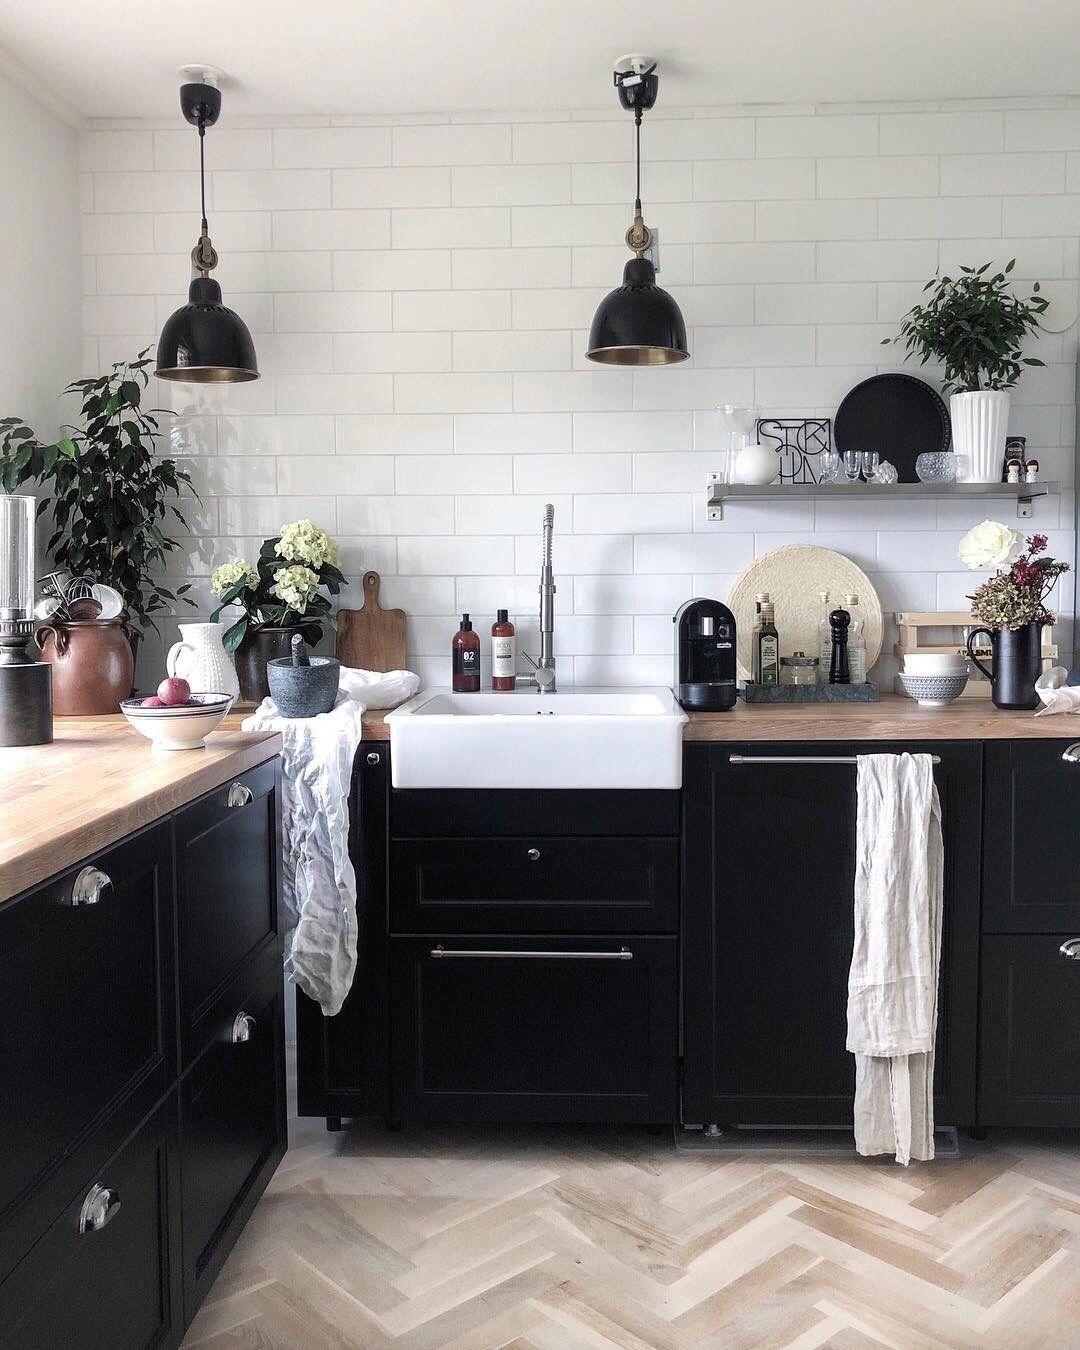 Scandi Style Kitchen With Black Cabinets Kitchencabinets In 2020 Scandinavian Interior Kitchen Kitchen Interior Kitchen Design